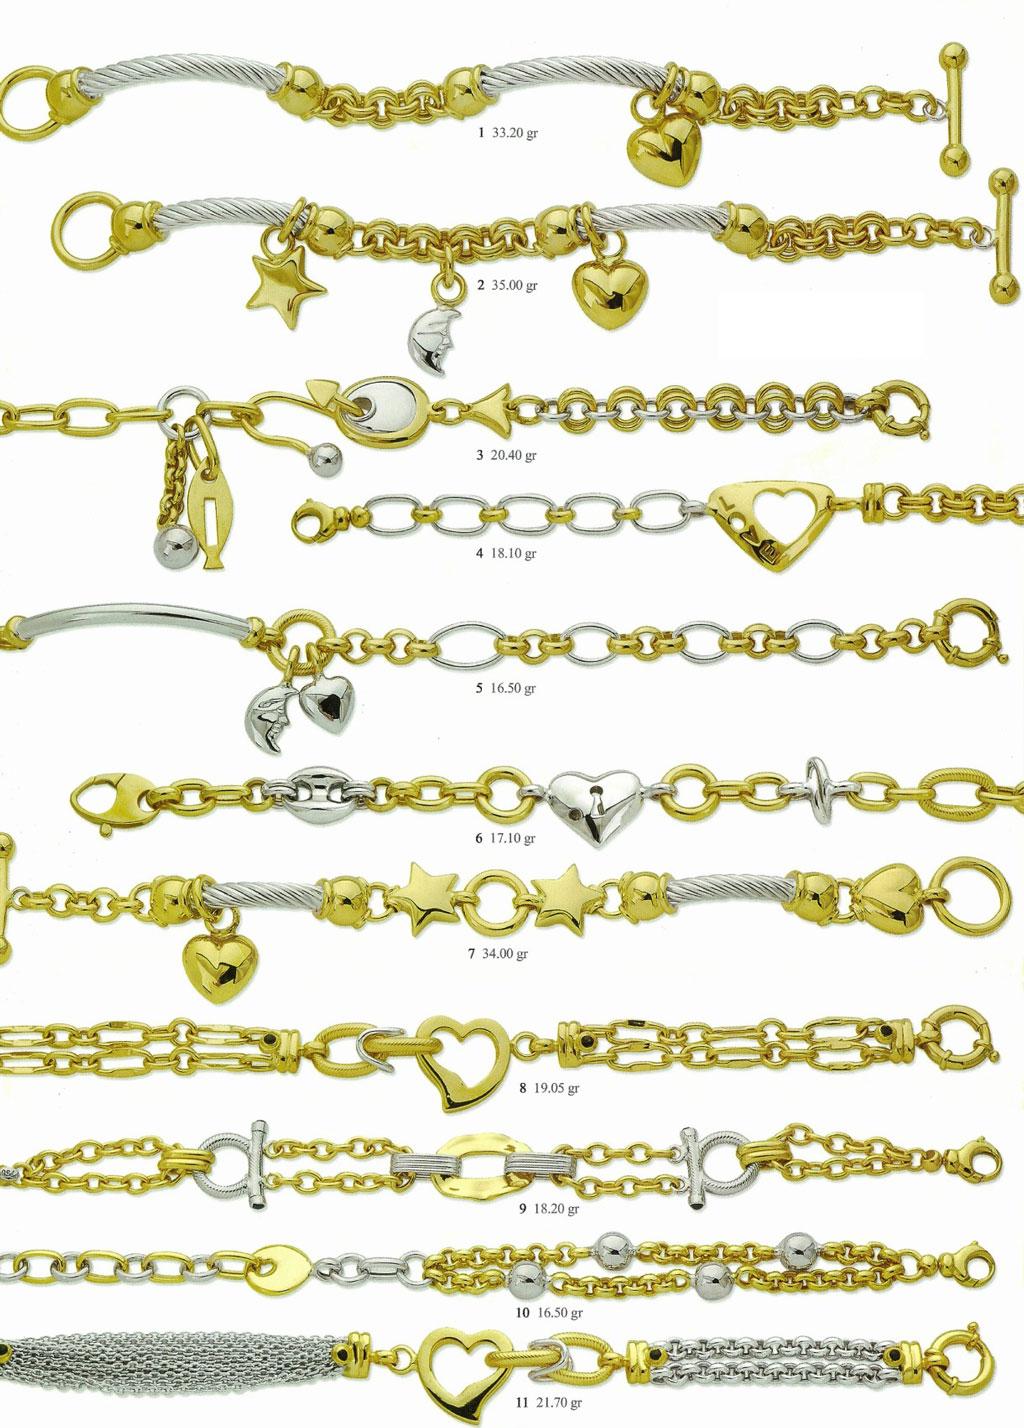 златни гривни синджирни